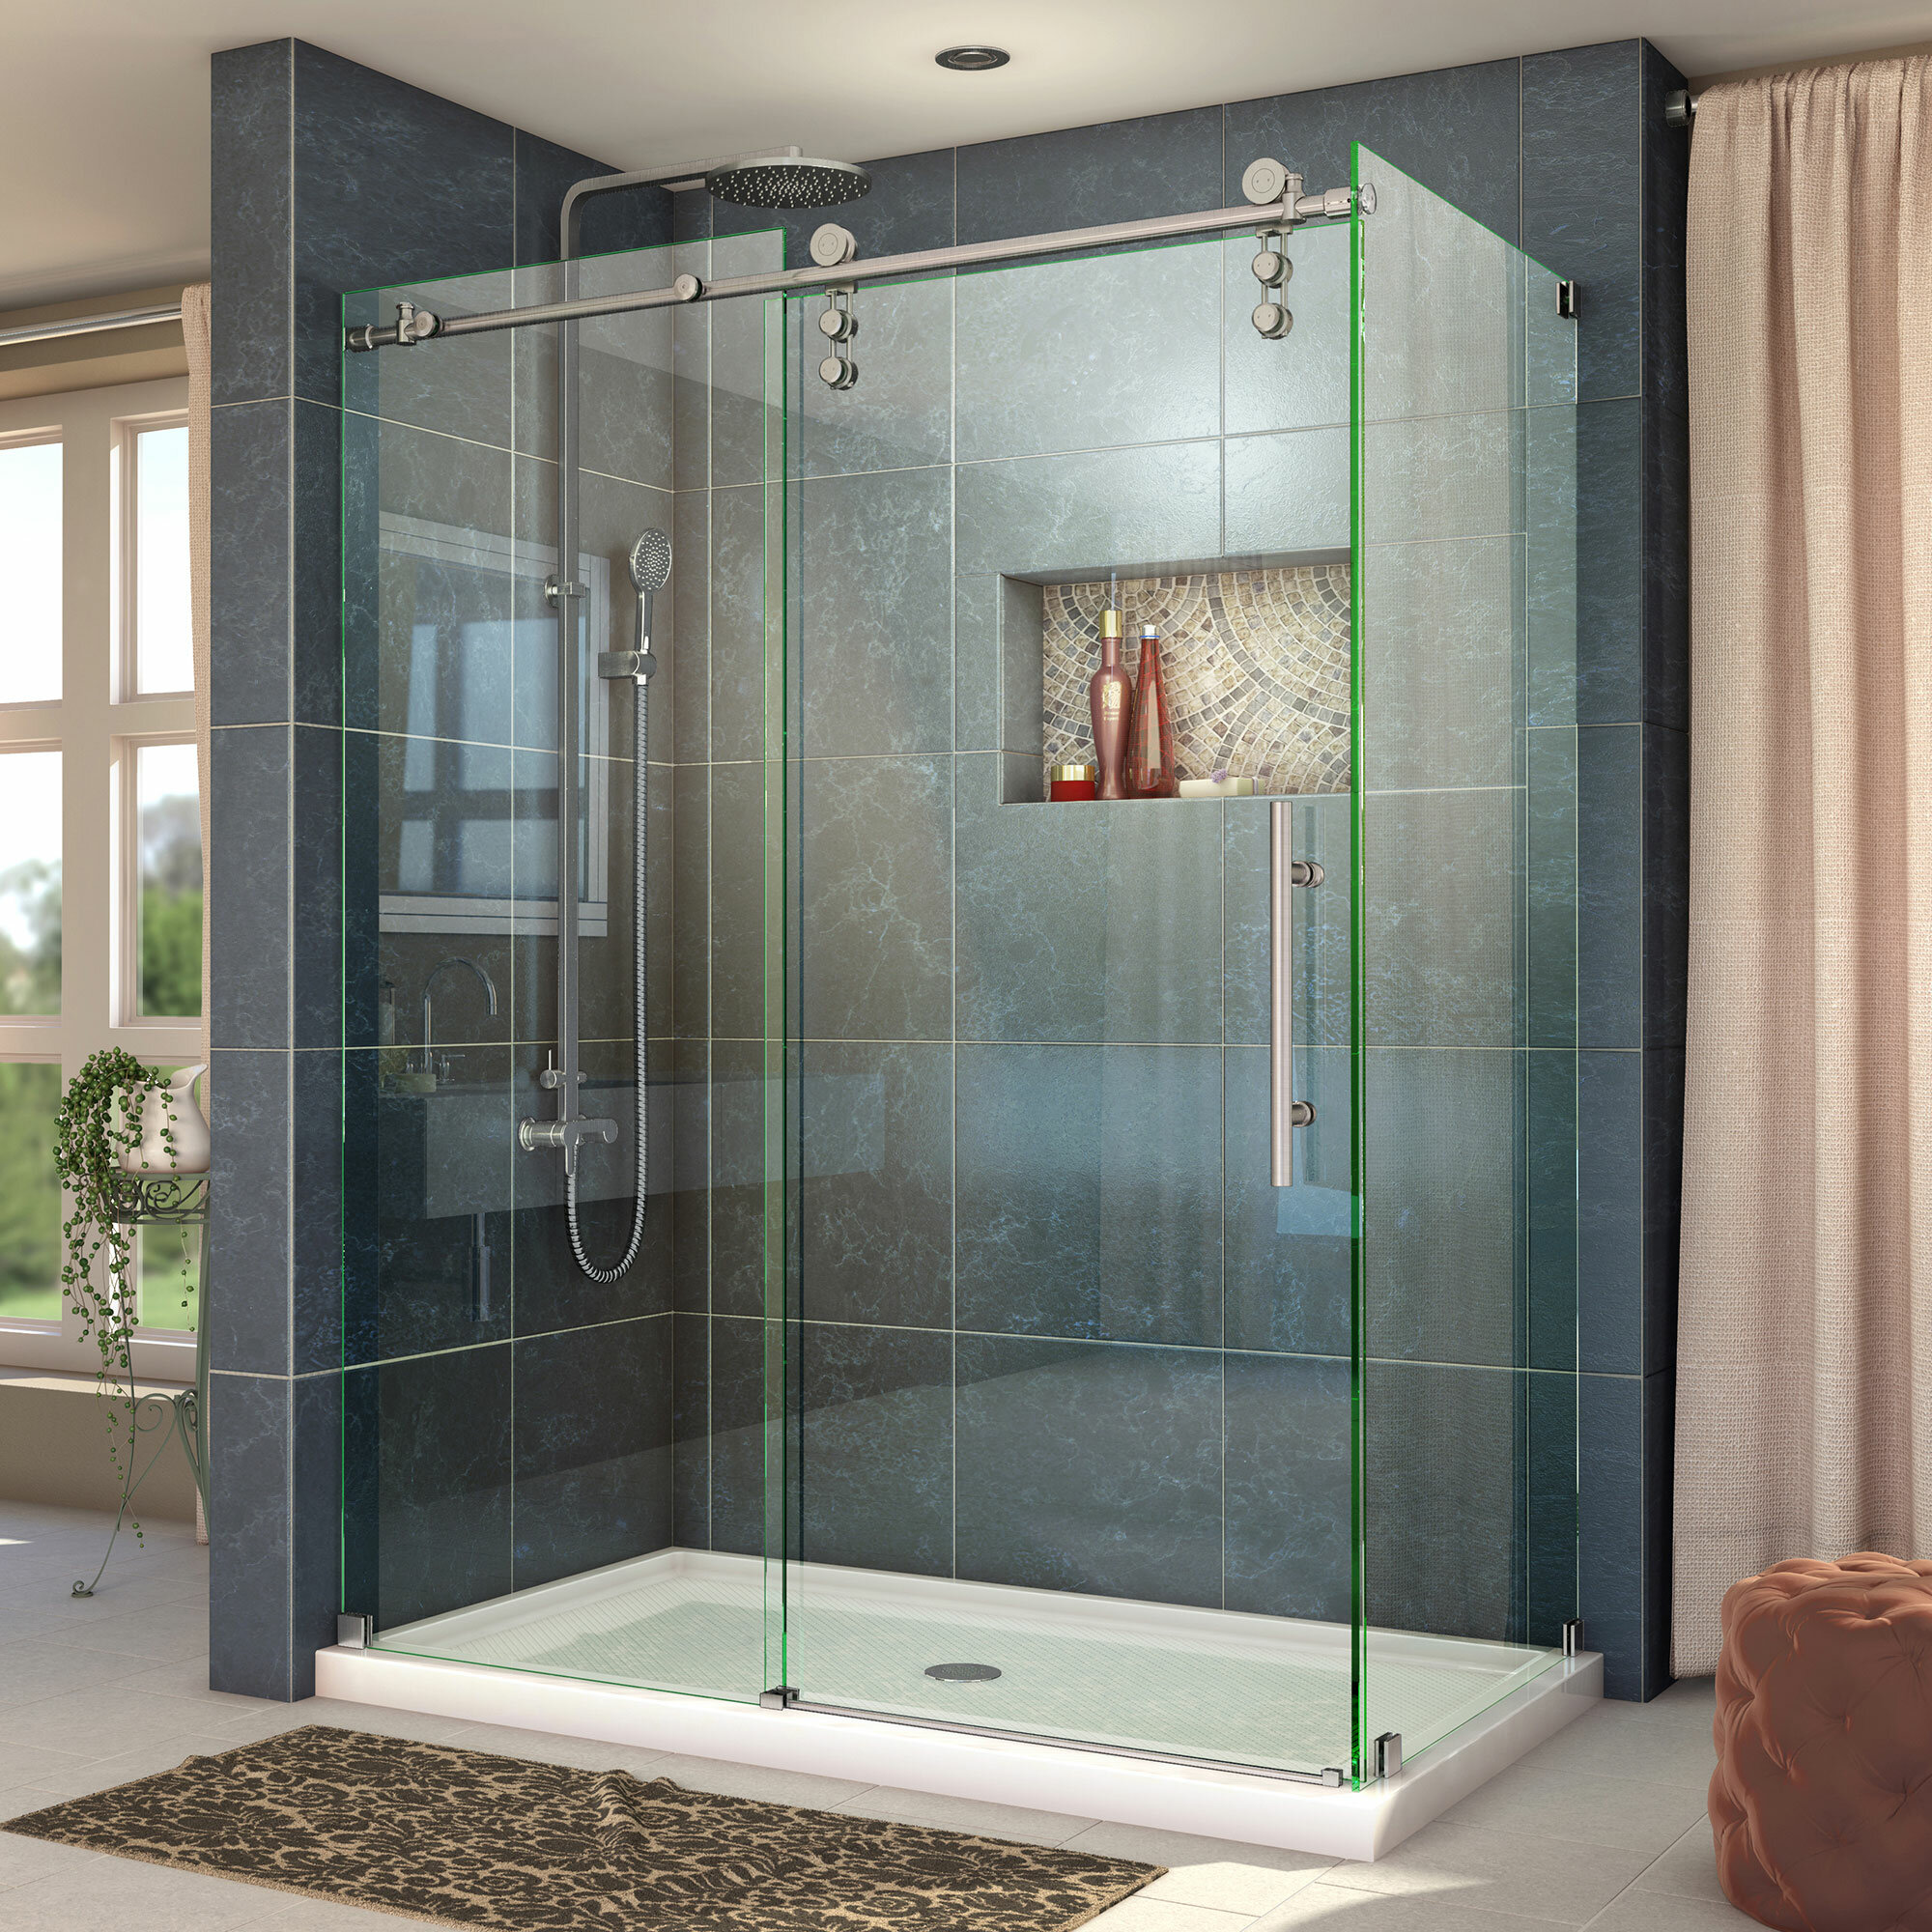 Dreamline Enigma Z 60 38 X 76 Single Sliding Frameless Shower Door With Clear Max Technology Reviews Wayfair